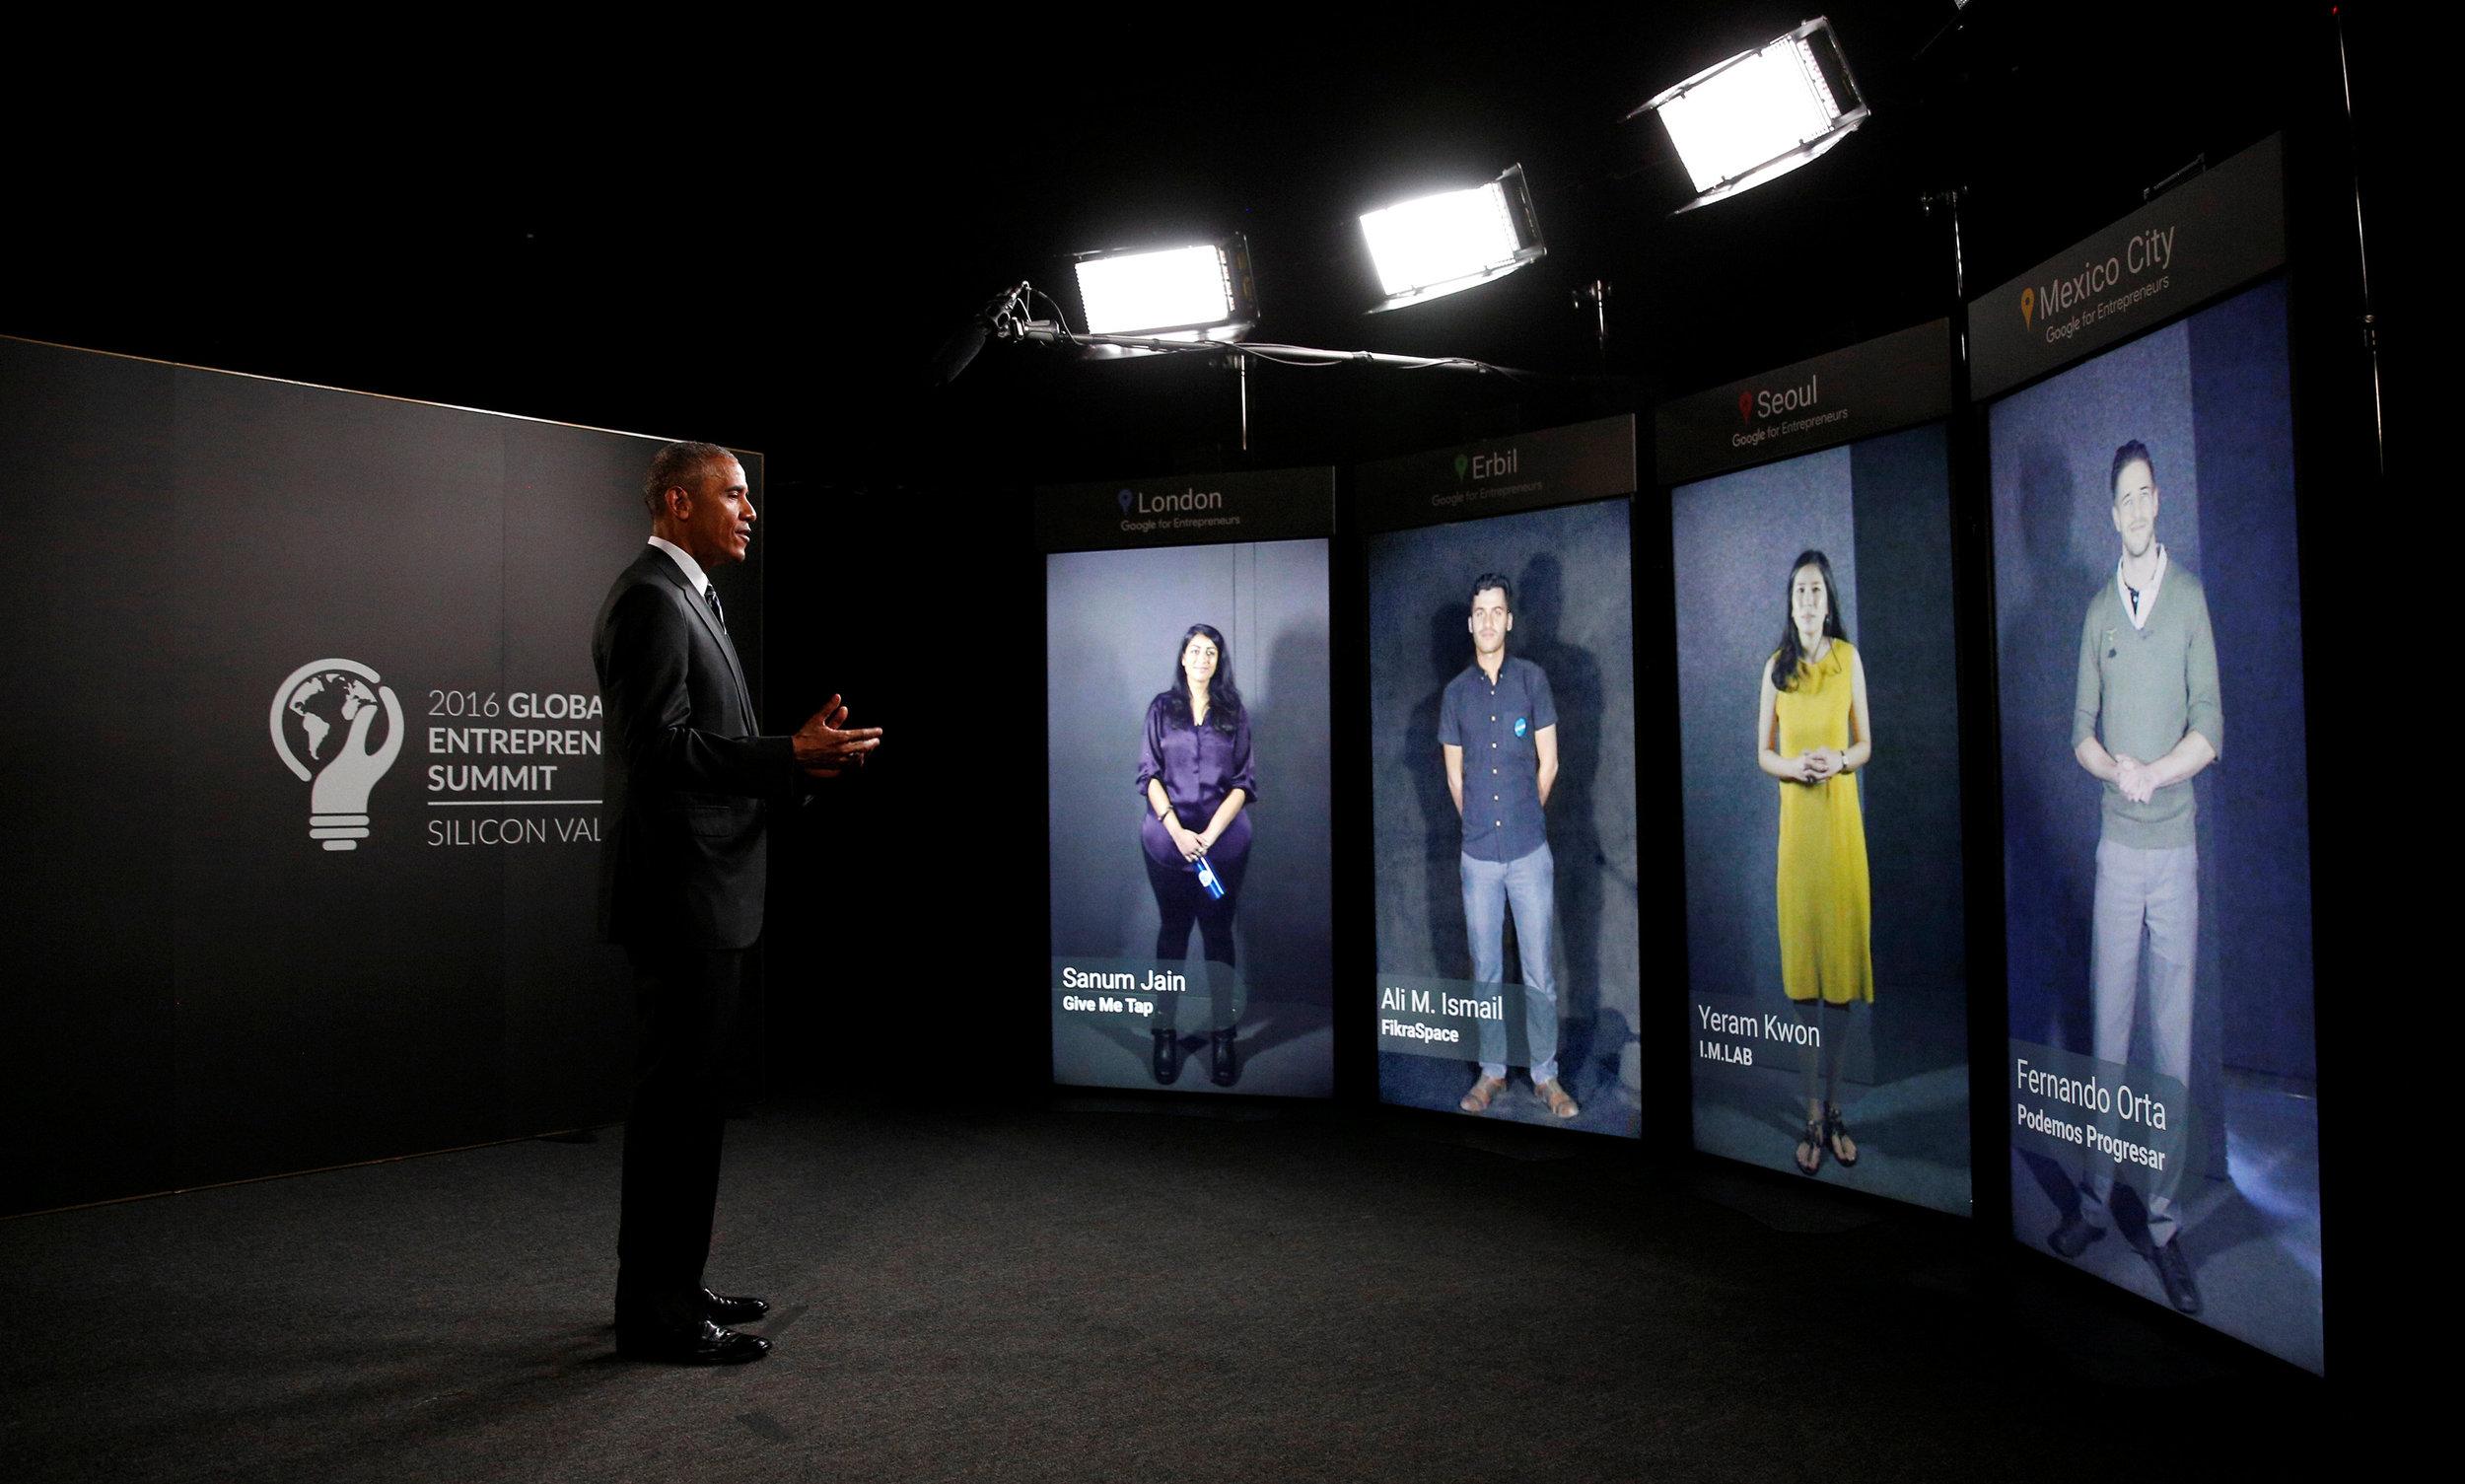 President Obama speaking to entrepreneurs in South Korea, Iraq, Mexico and the UK through Portal Screens